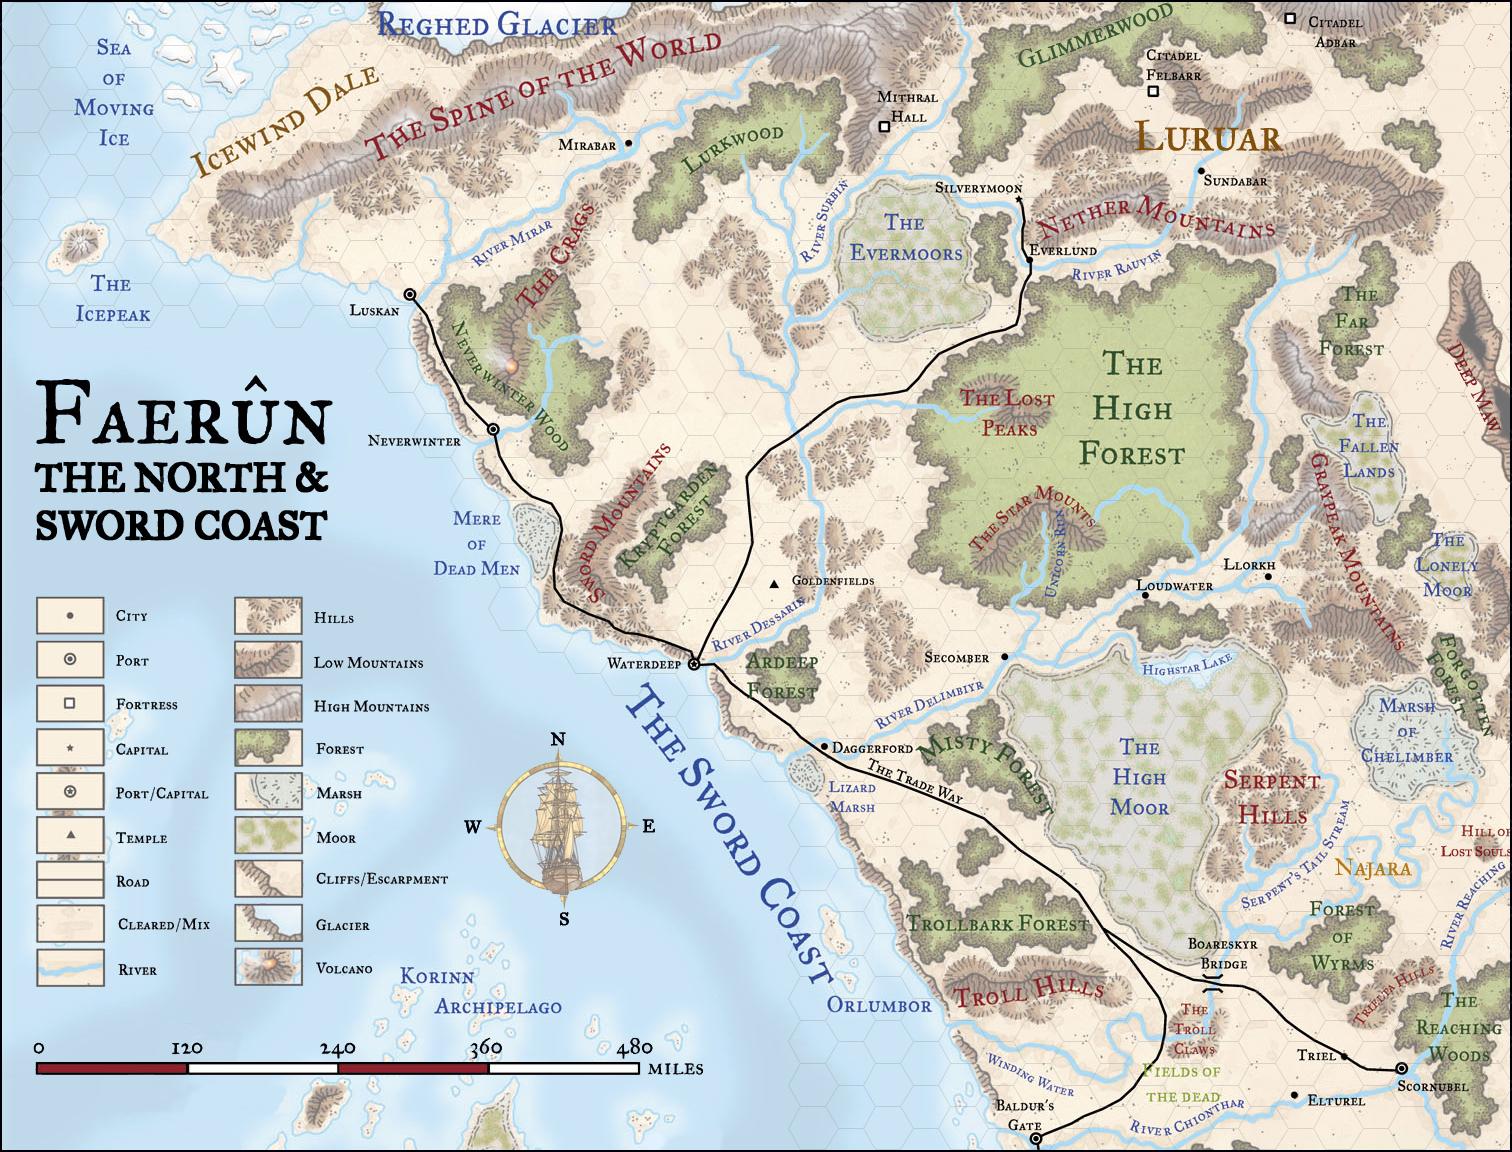 Faerun North Sword Coast